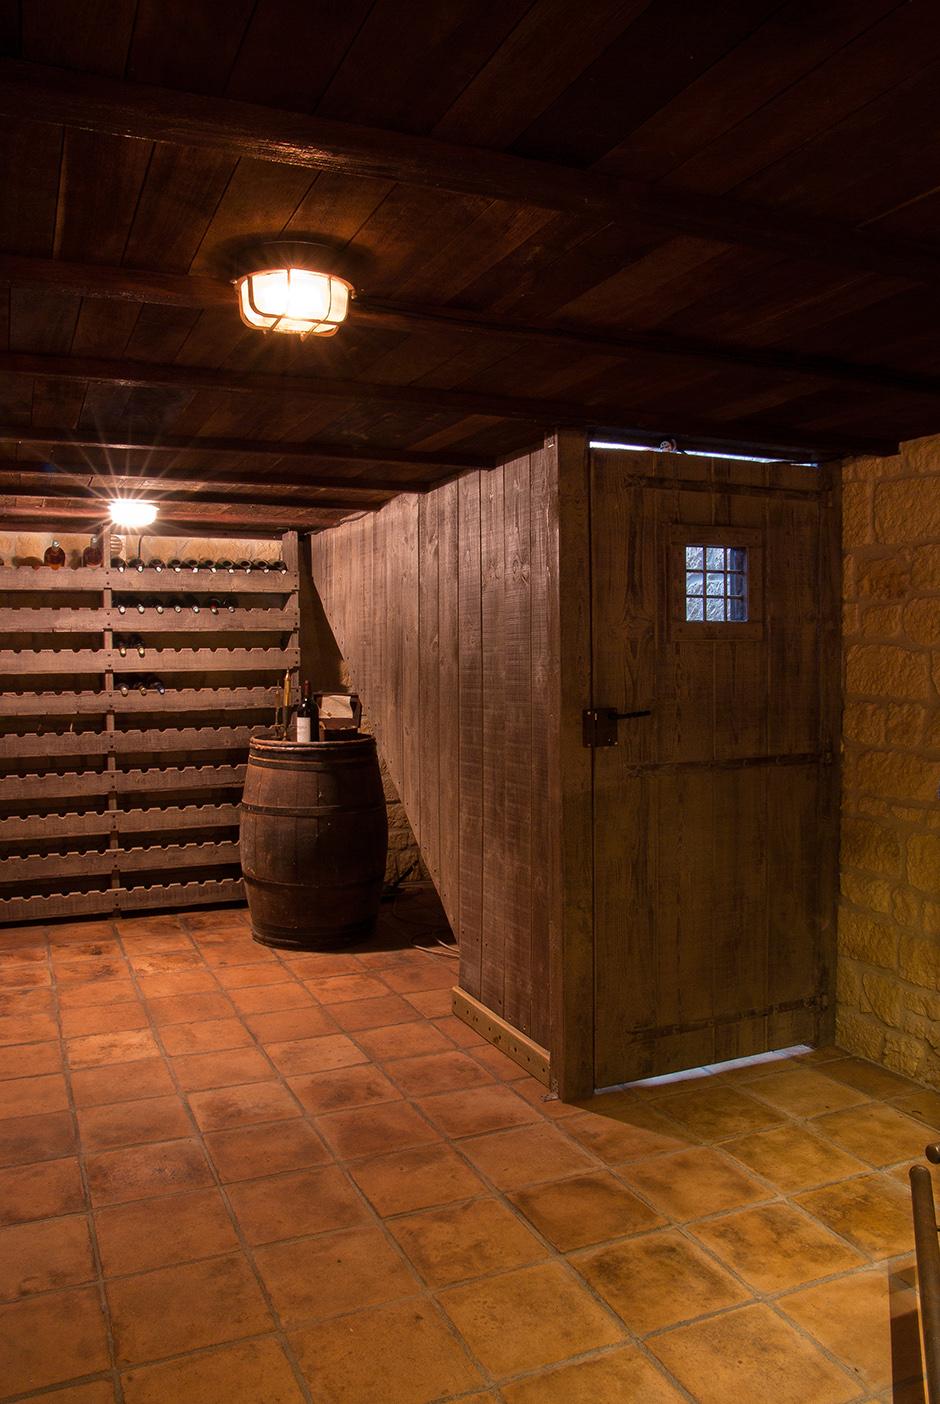 comment bien choisir sa cave vin personnelle. Black Bedroom Furniture Sets. Home Design Ideas